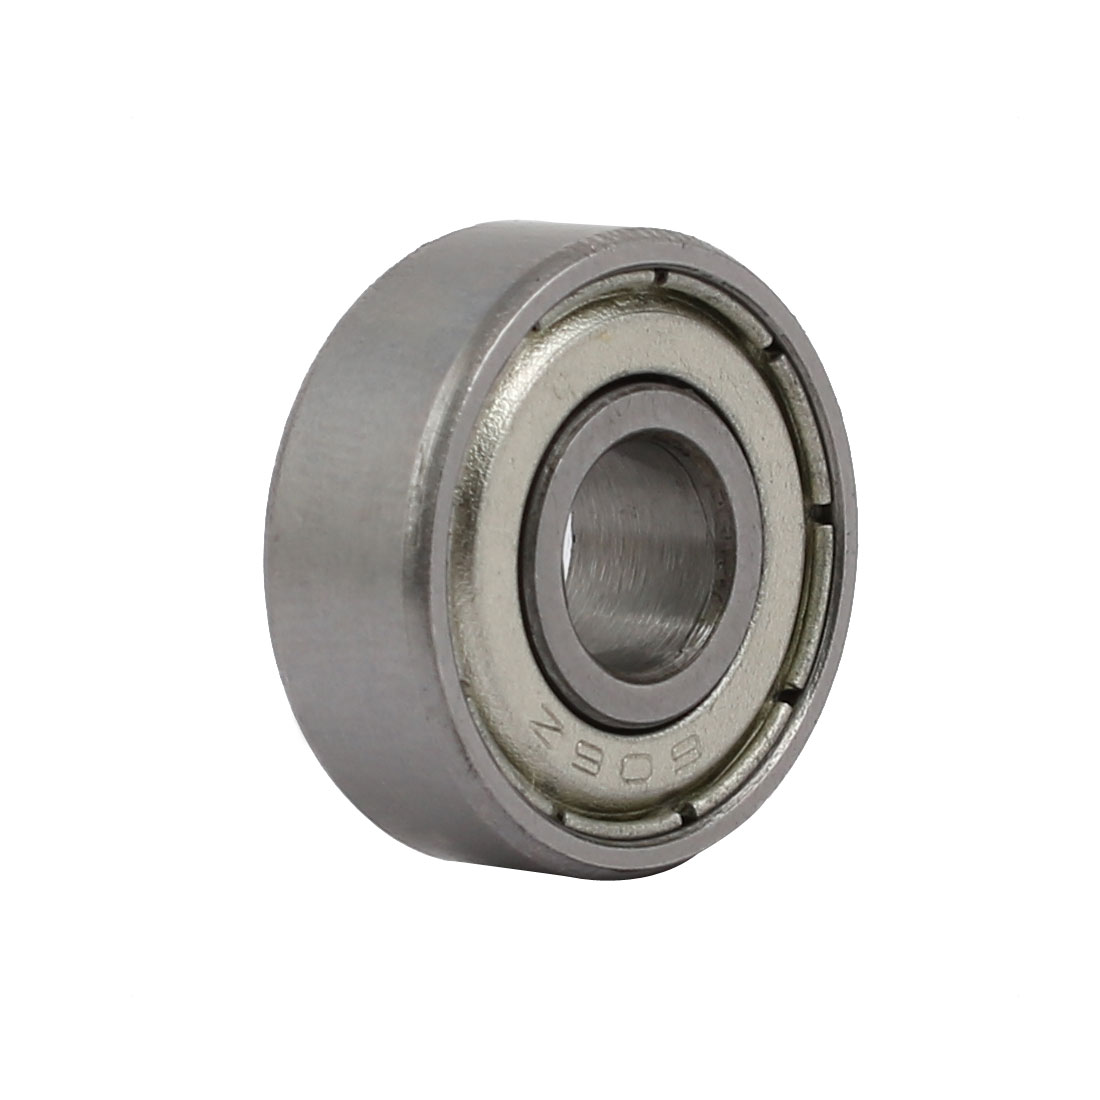 606Z 6mmx17mmx16mm Shielded Deep Groove Ball Bearings Silver Tone 4pcs